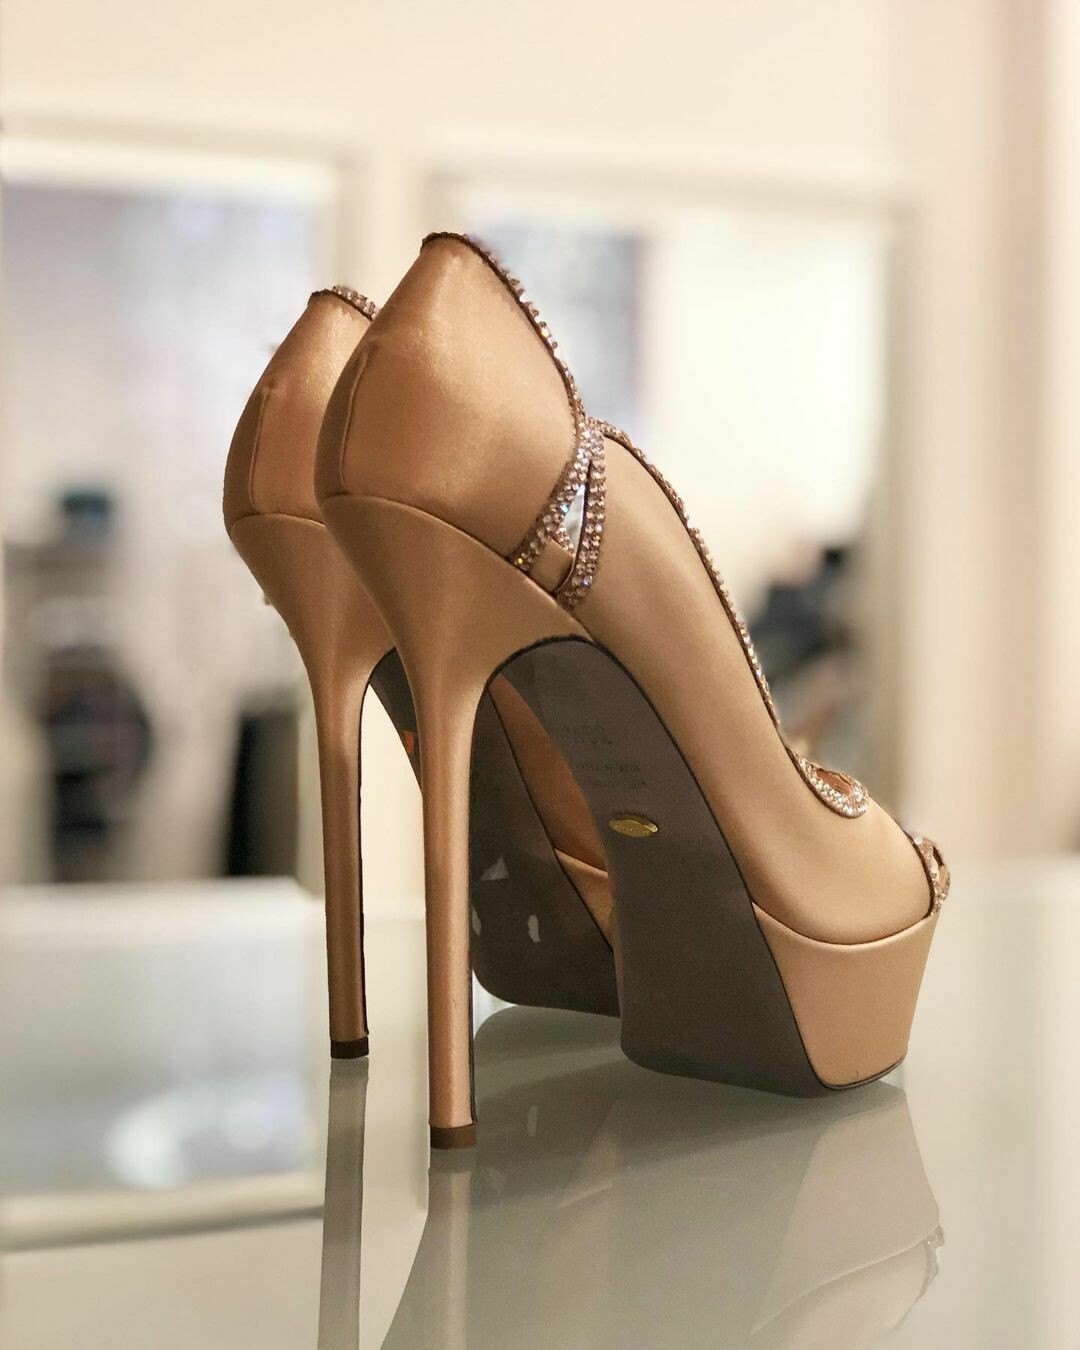 Новые туфли от Sergio Rossi